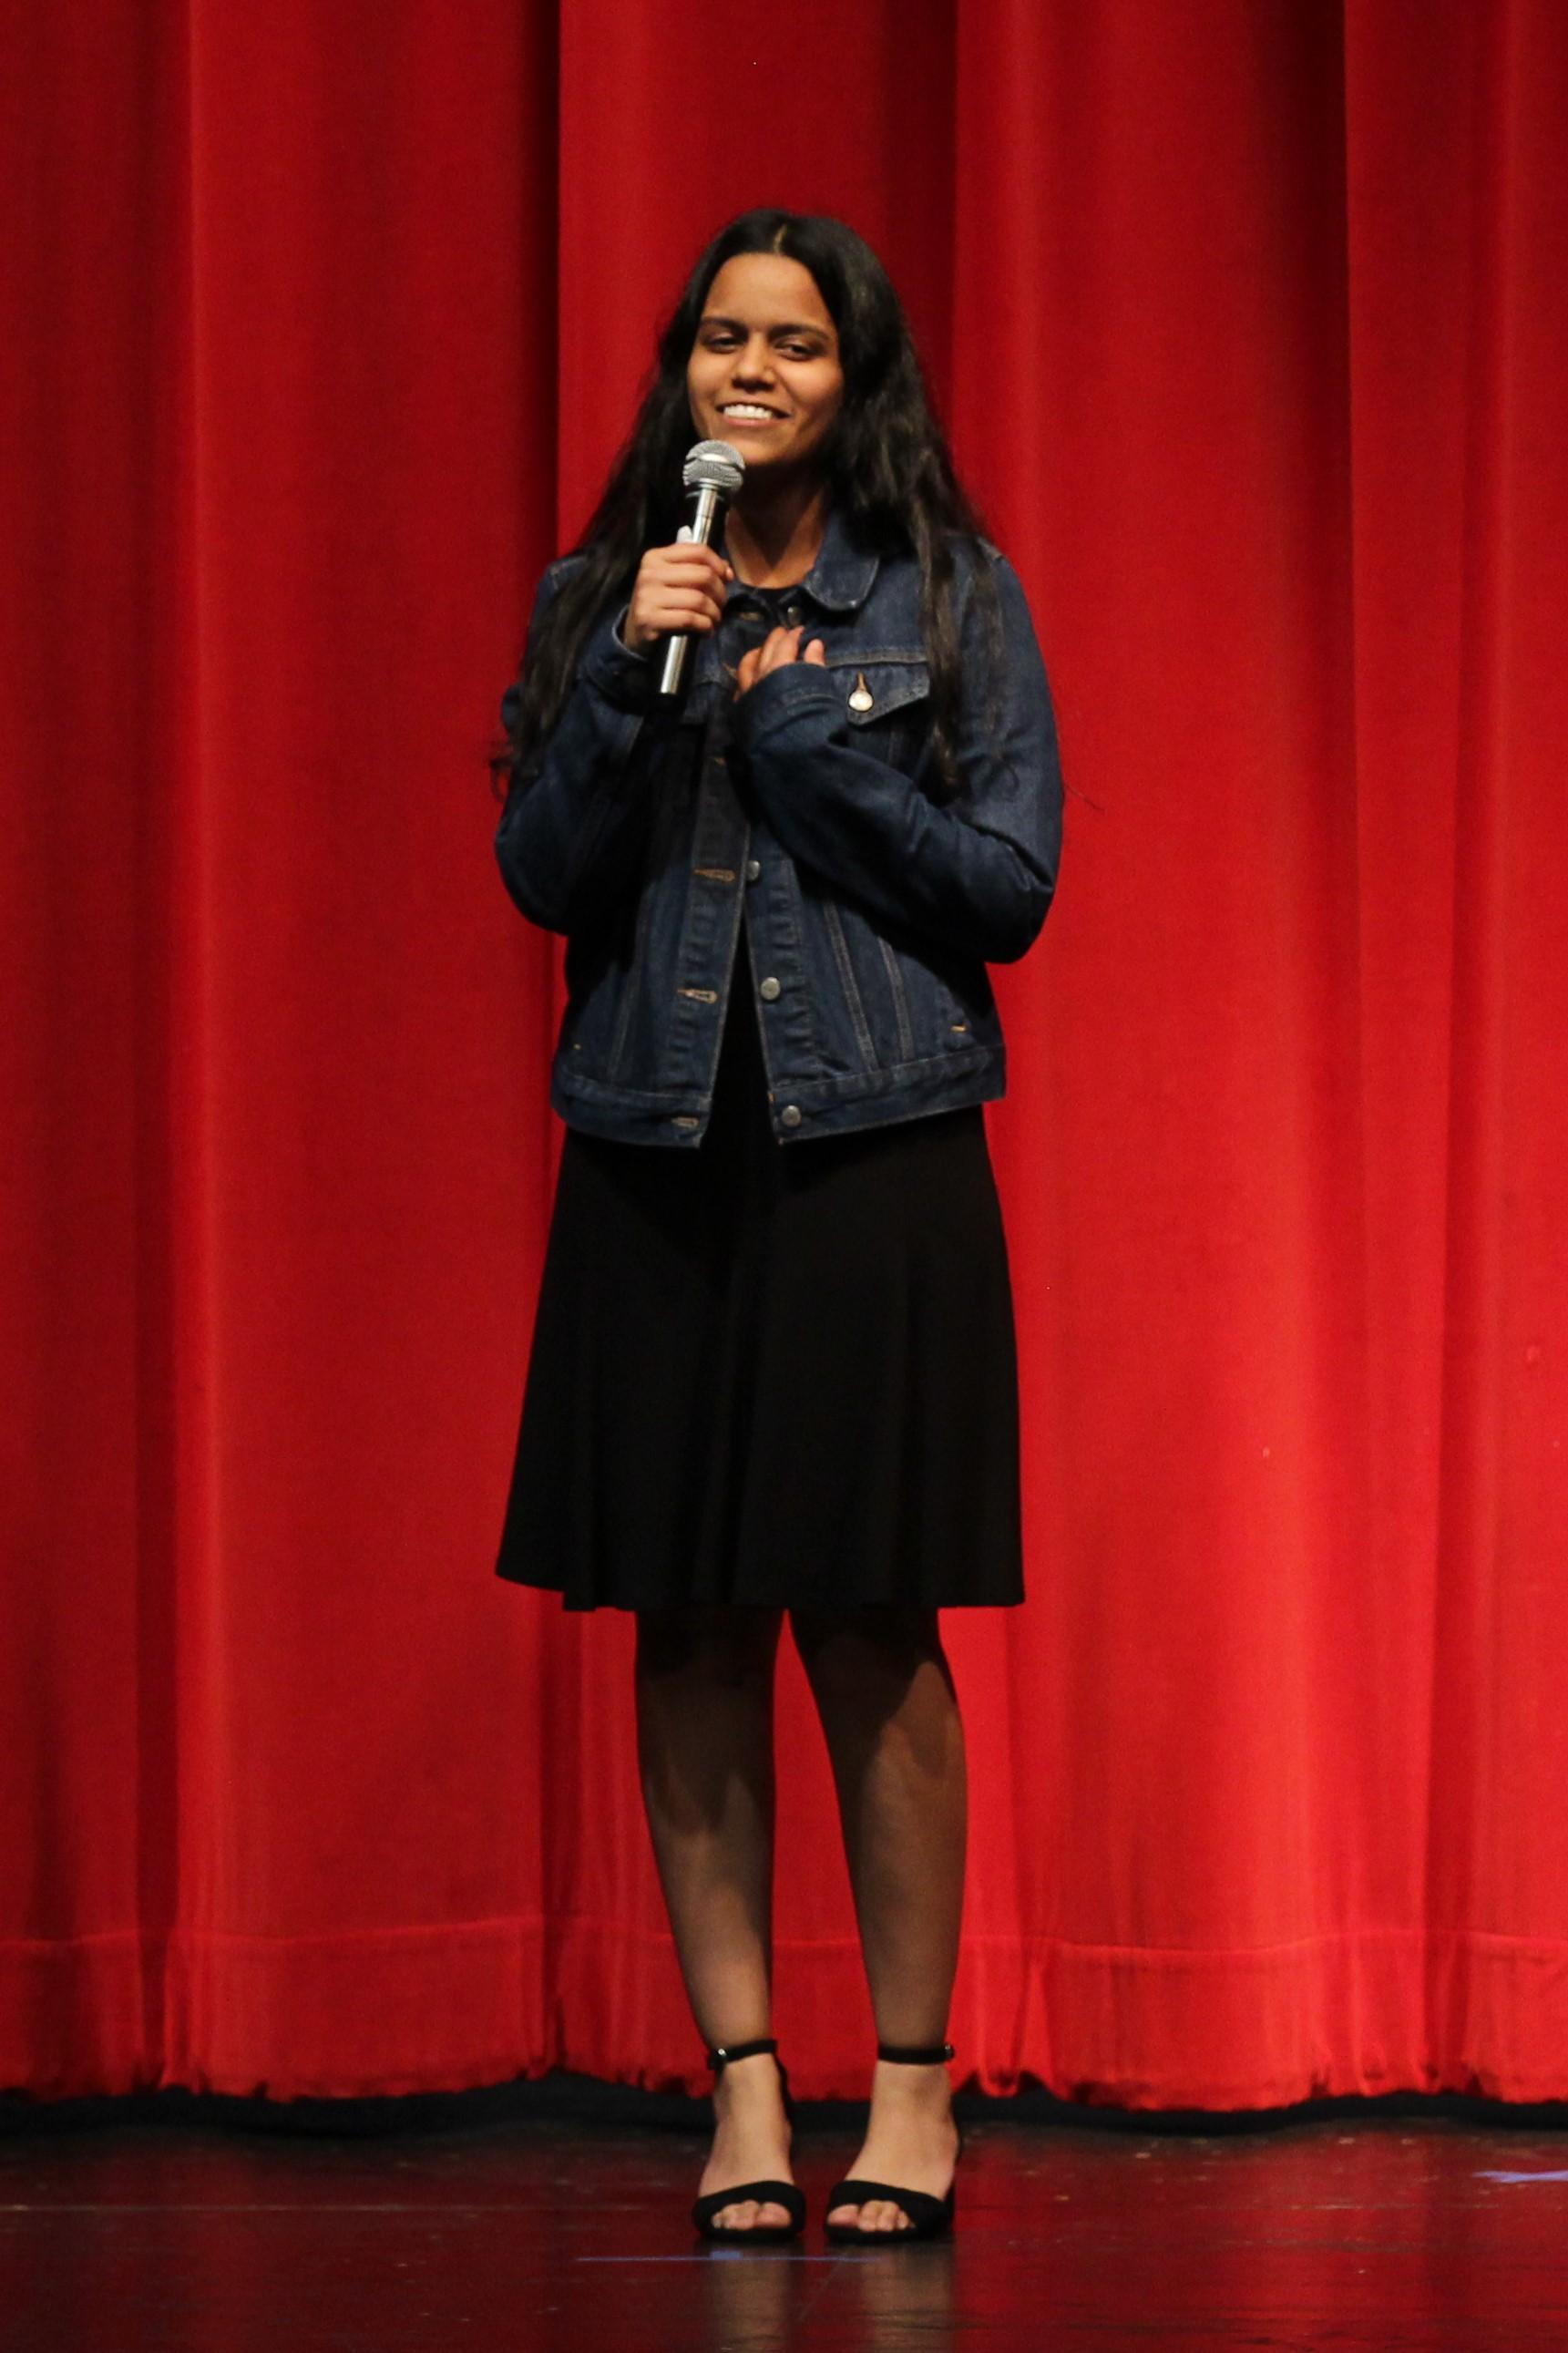 Natasha Bhardwaj singing at the talent show